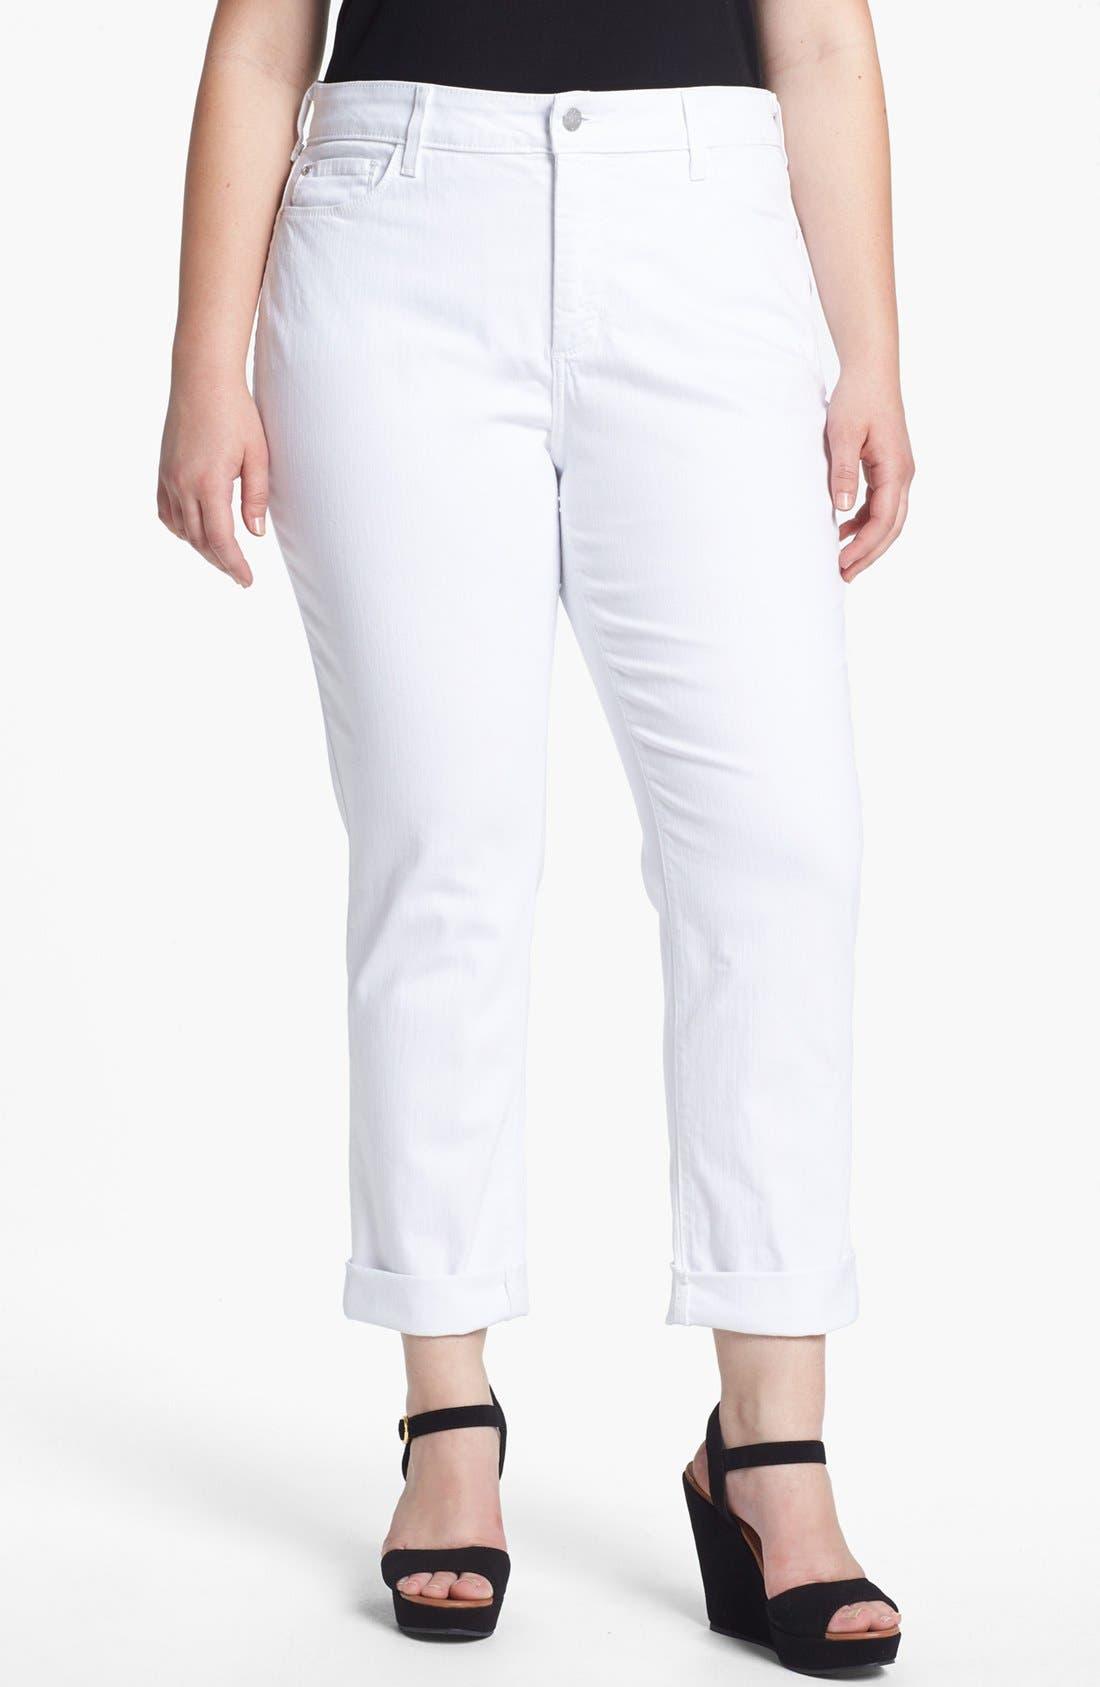 Alternate Image 1 Selected - NYDJ 'Tanya' Cuff Boyfriend Jeans (Plus Size)